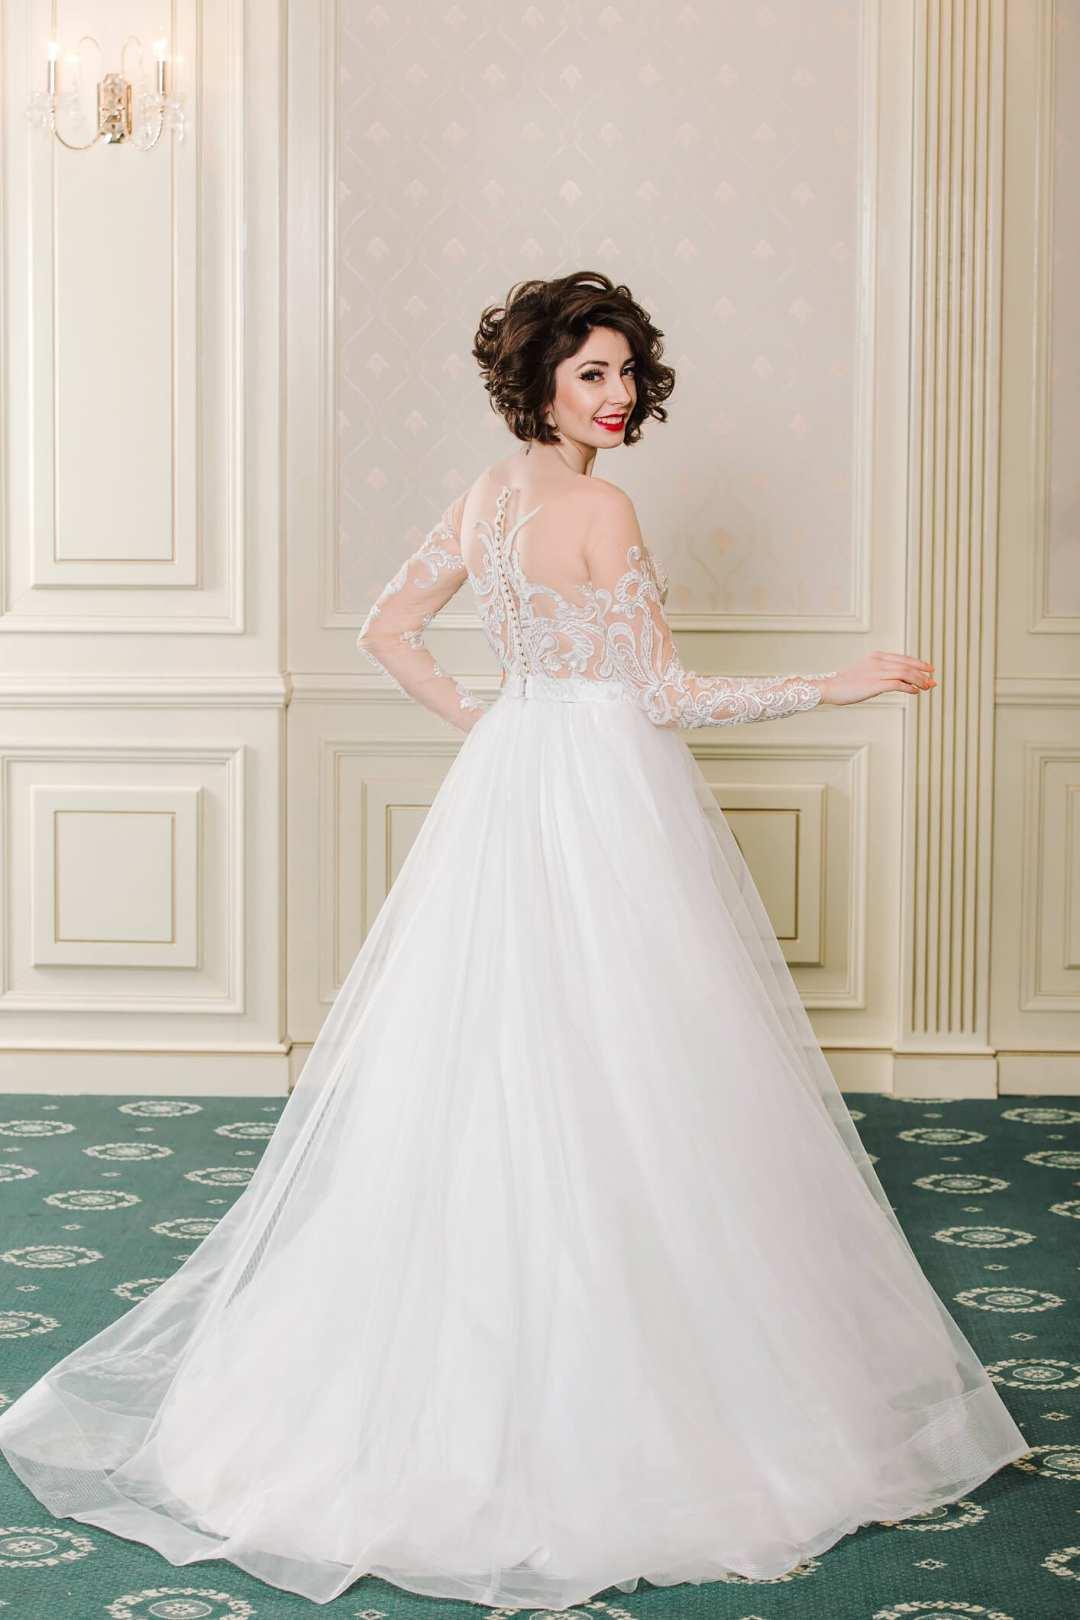 Indira - Bridal Couture 2019